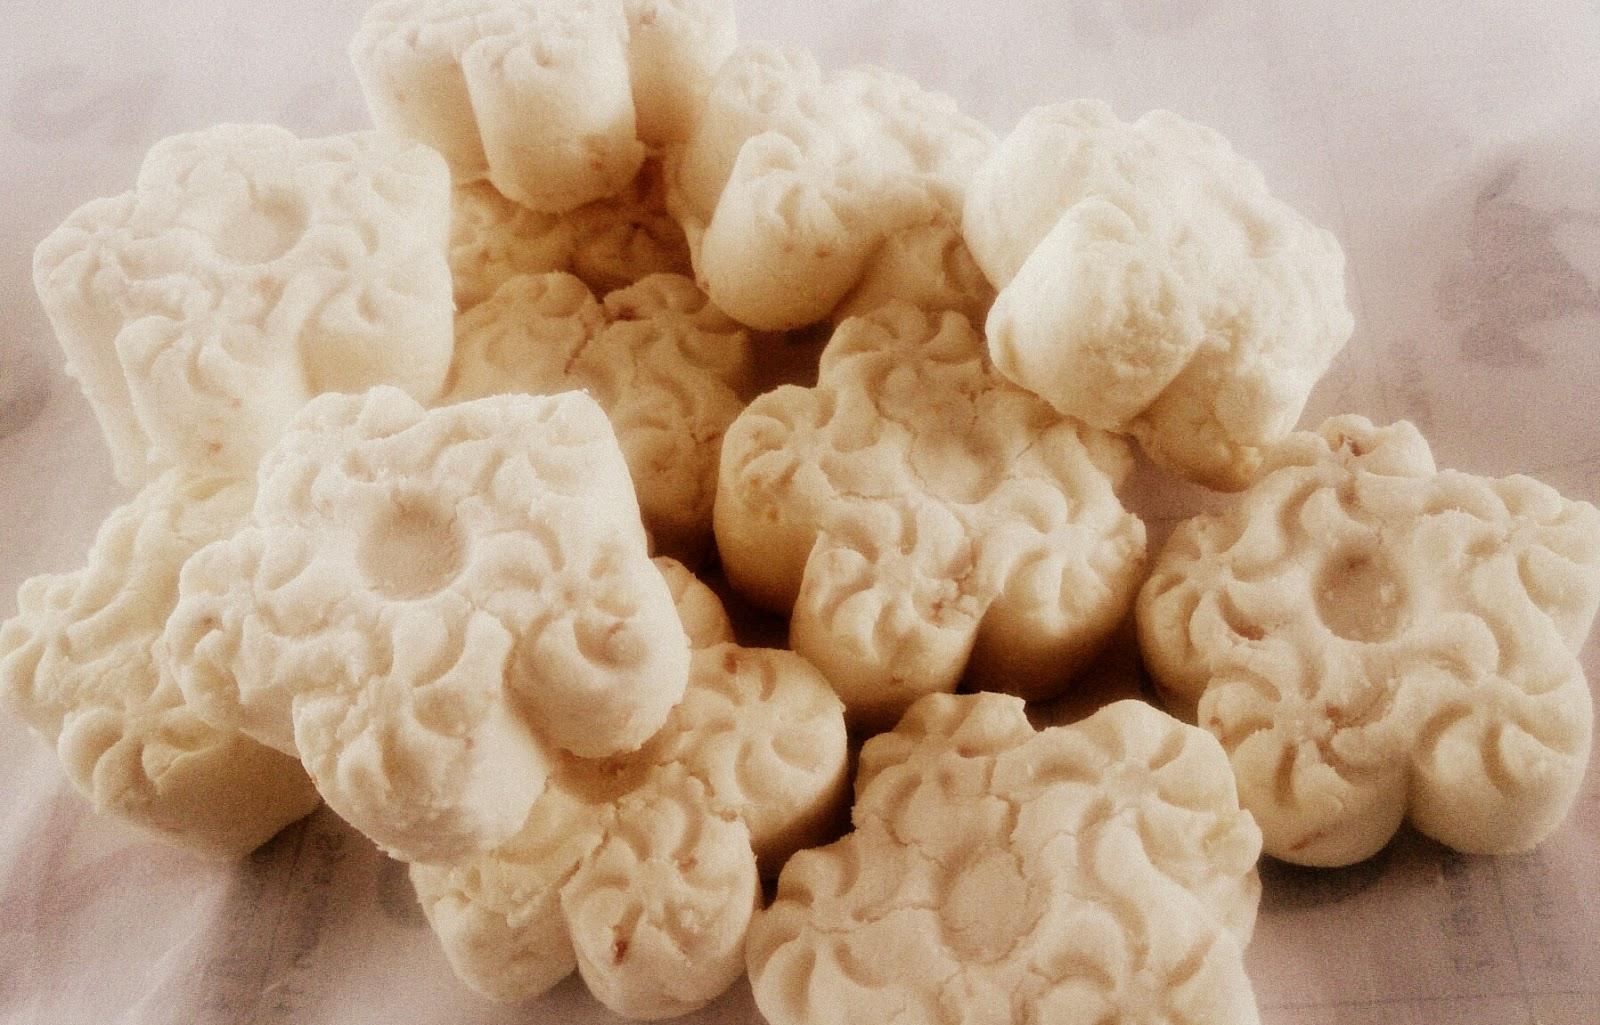 Cara buat resepi Biskut Bangkit Cheese - INA MURNI ENTERPRISE